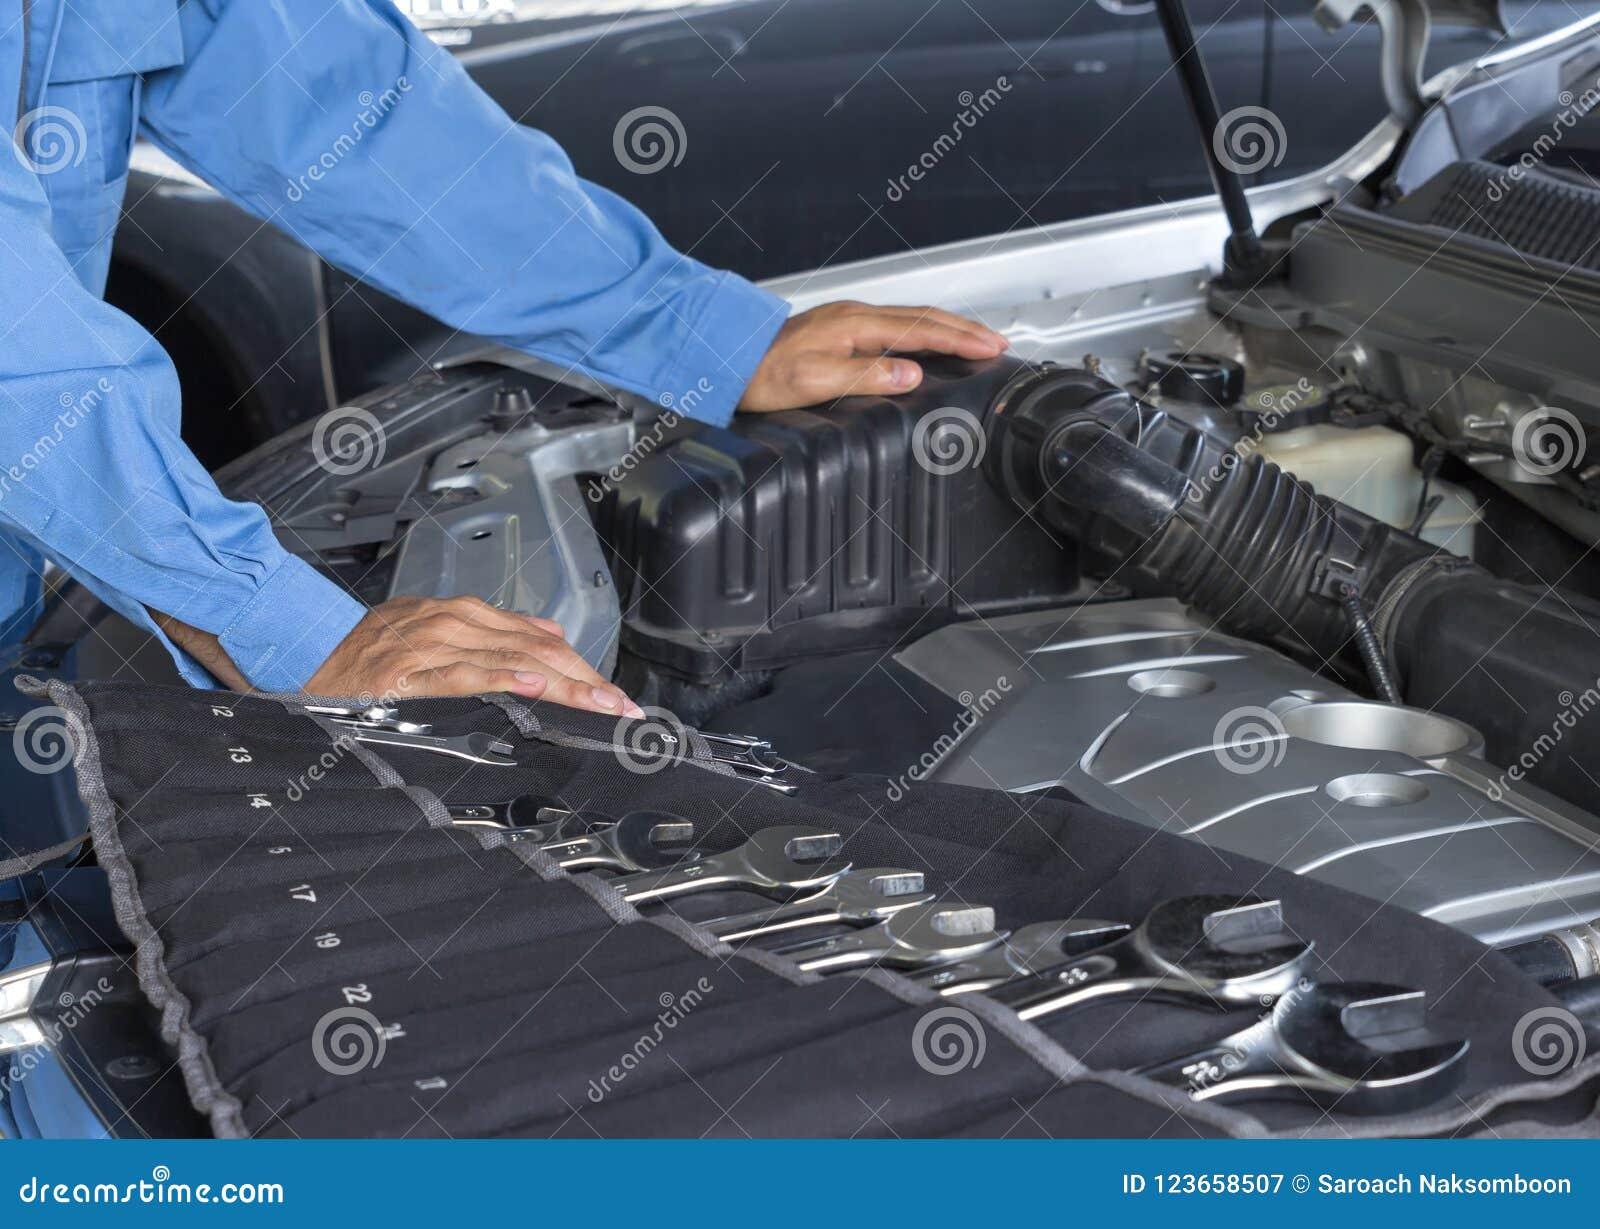 Car Repair Service, Auto Mechanic Repairing Car Engine Stock